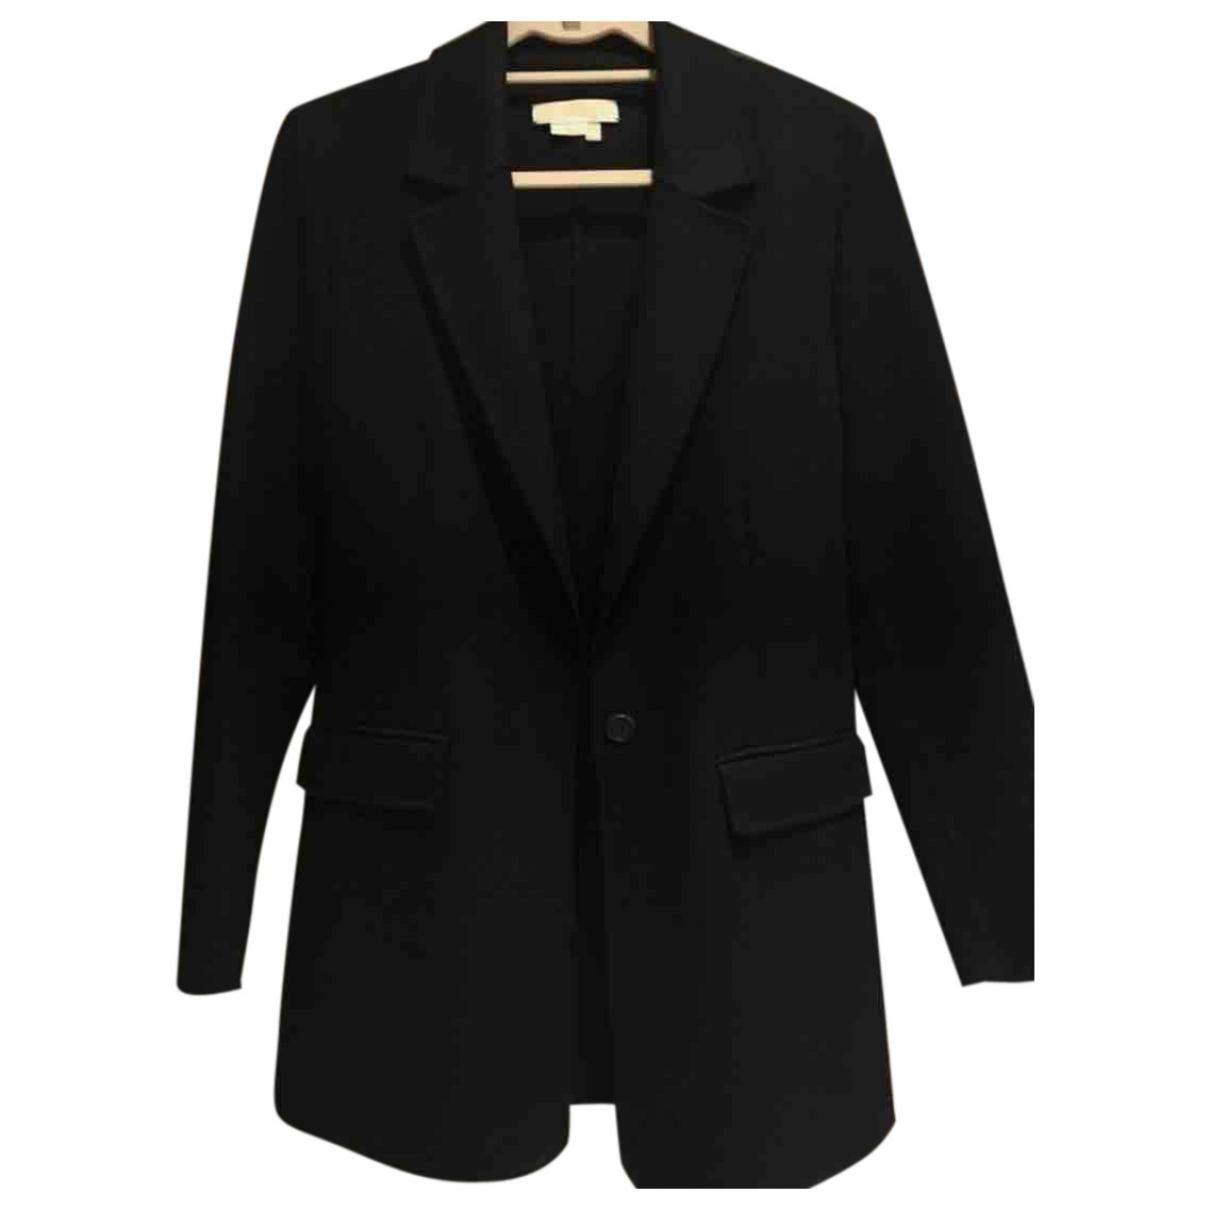 Michael Kors \N Black Wool jacket for Women 32 FR